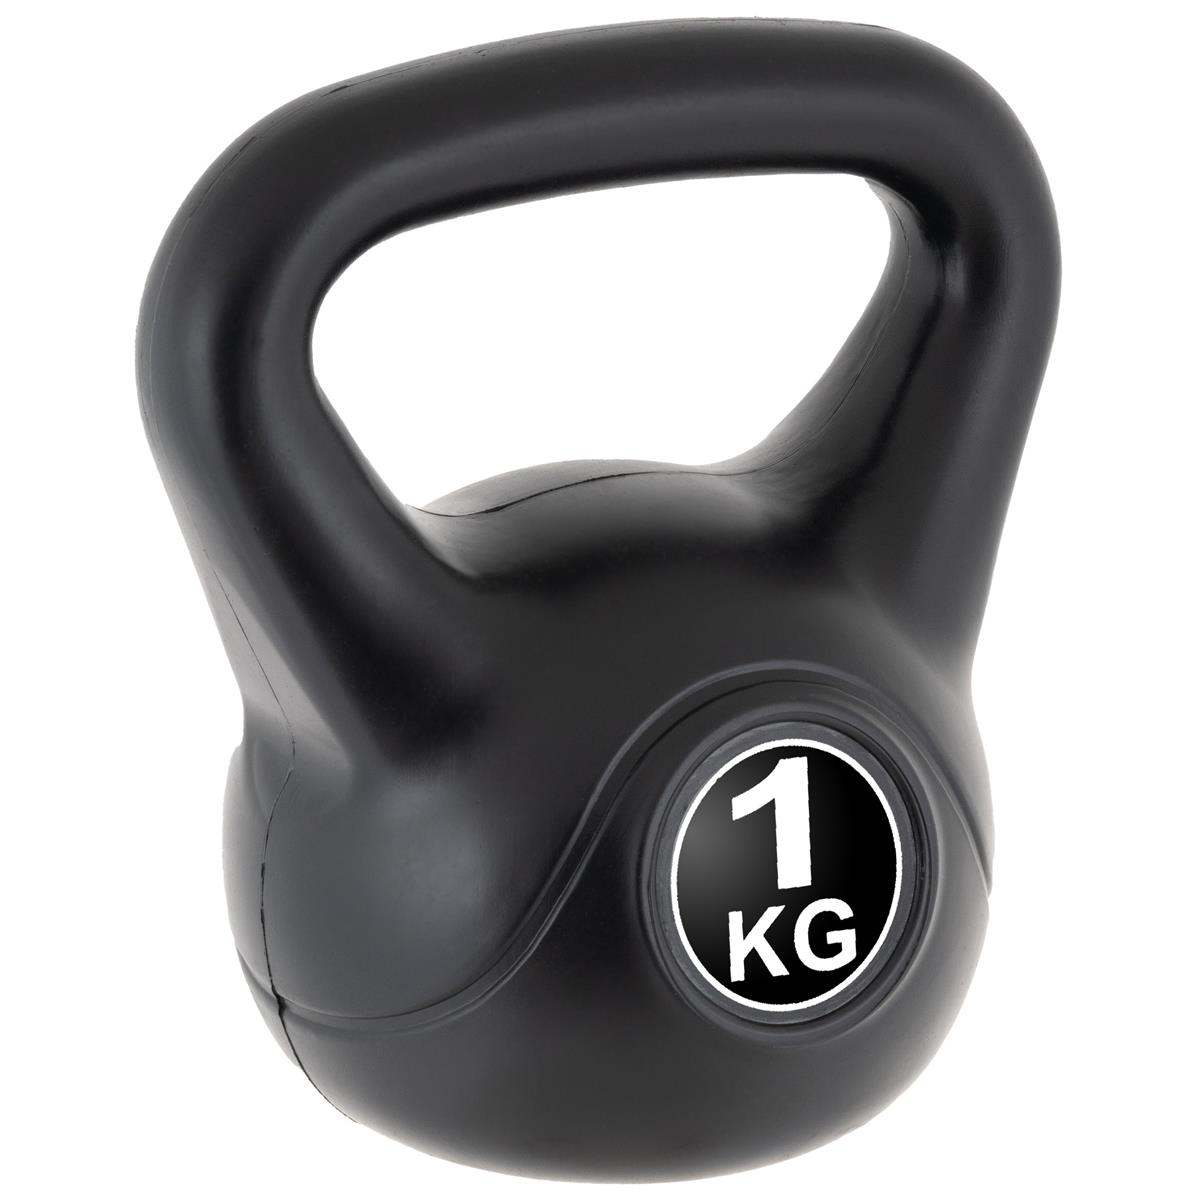 MAXXIVA Kettlebell Kugelhantel 1kg schwarz Krafttraining Fitness